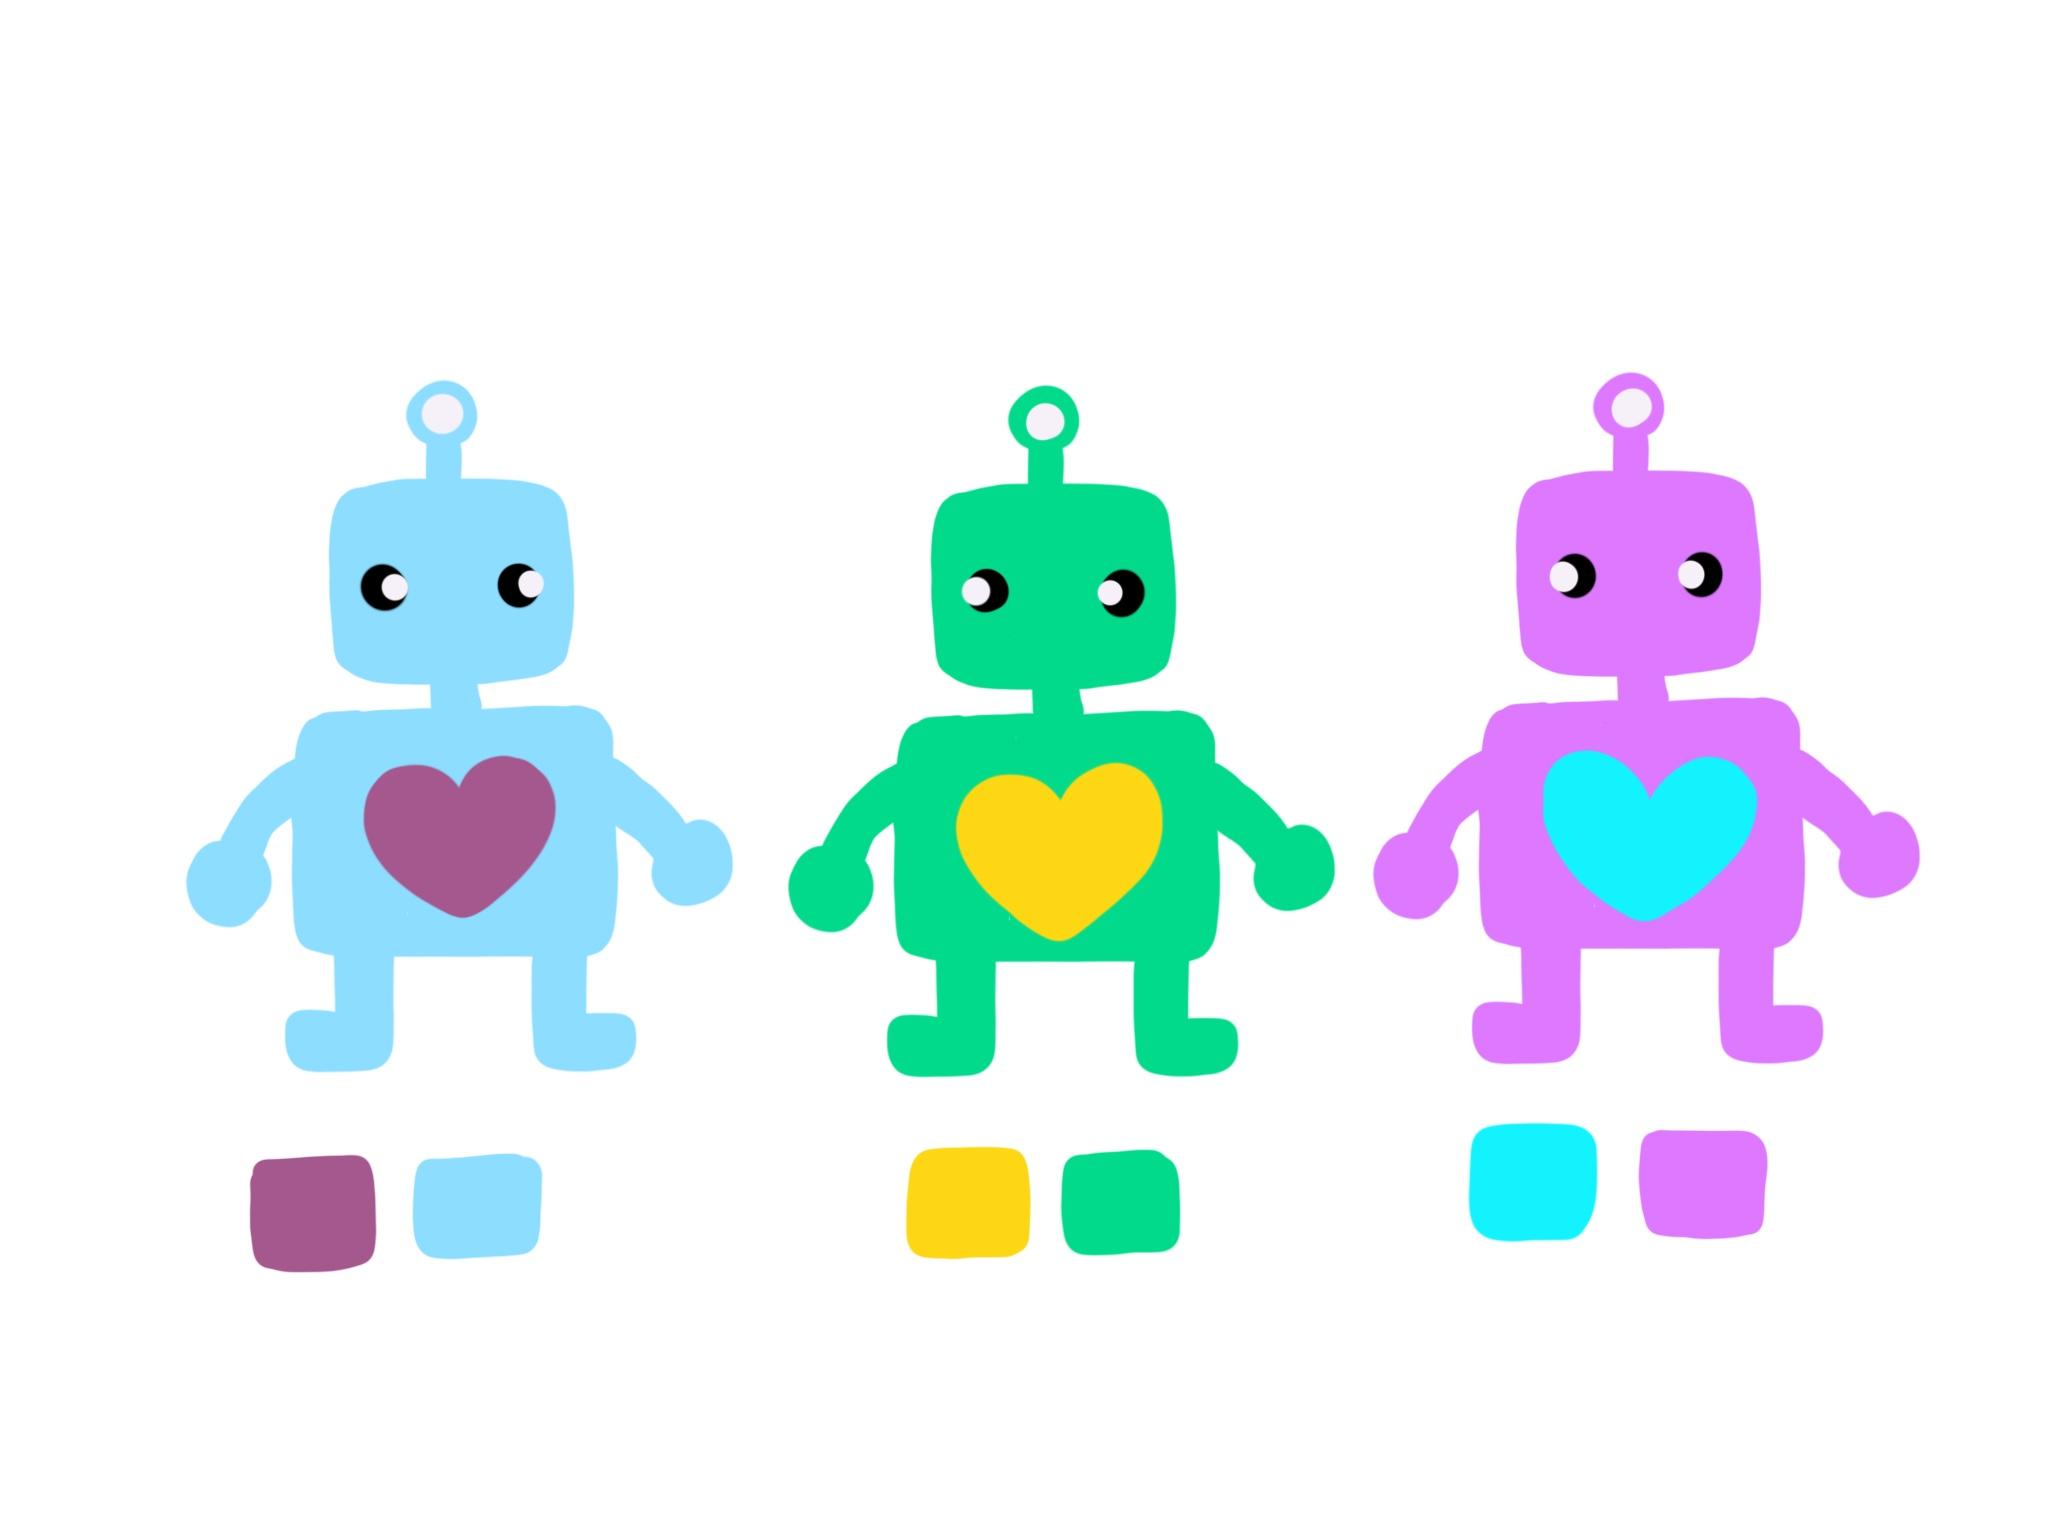 Bo's Robot Friends